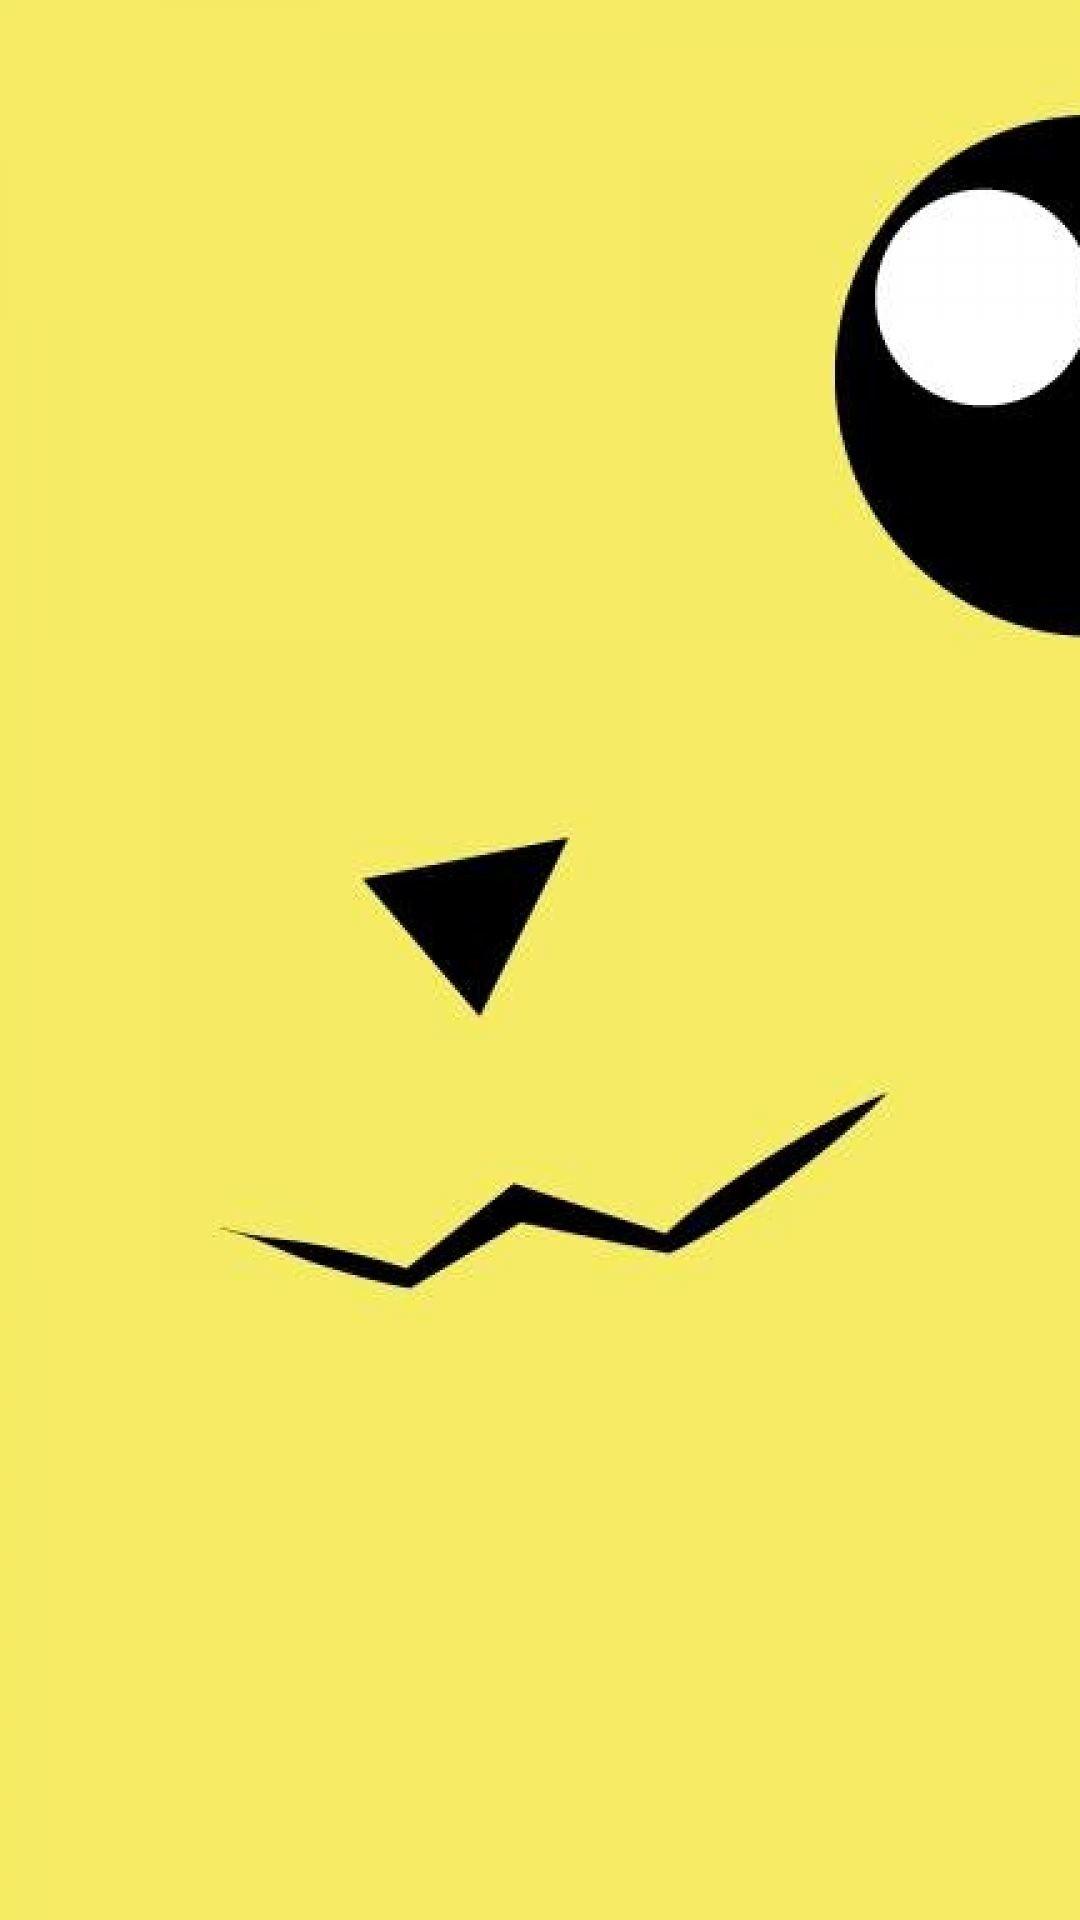 wallpaper de pikachu hd